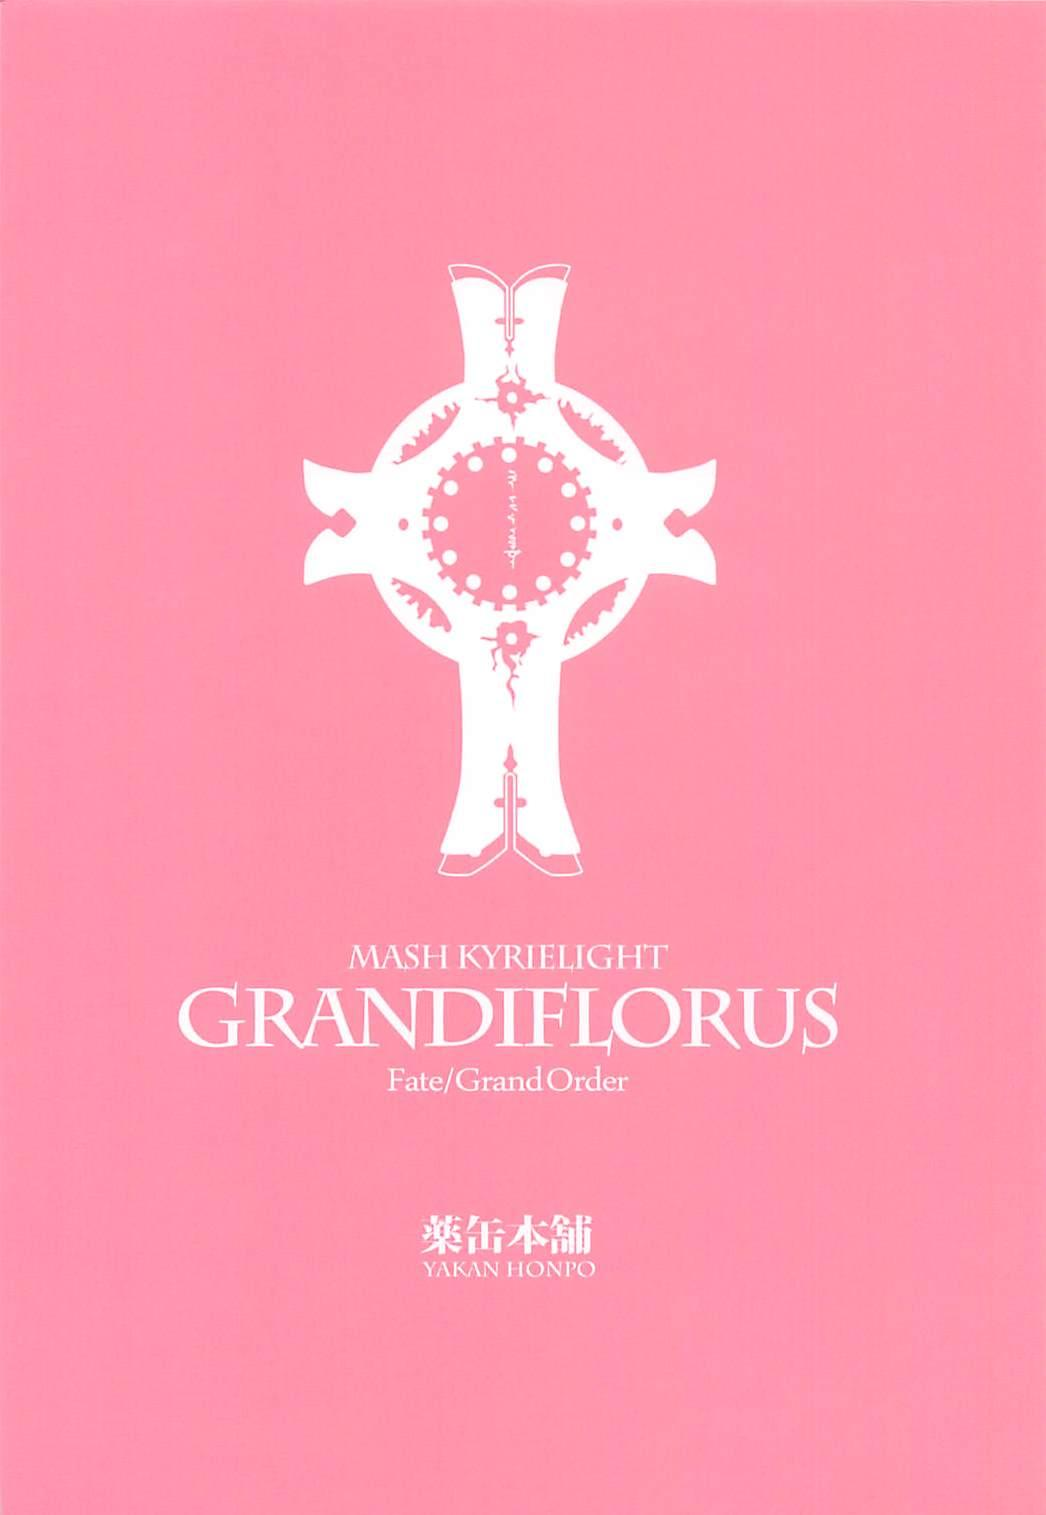 GRANDIFLORUS 25